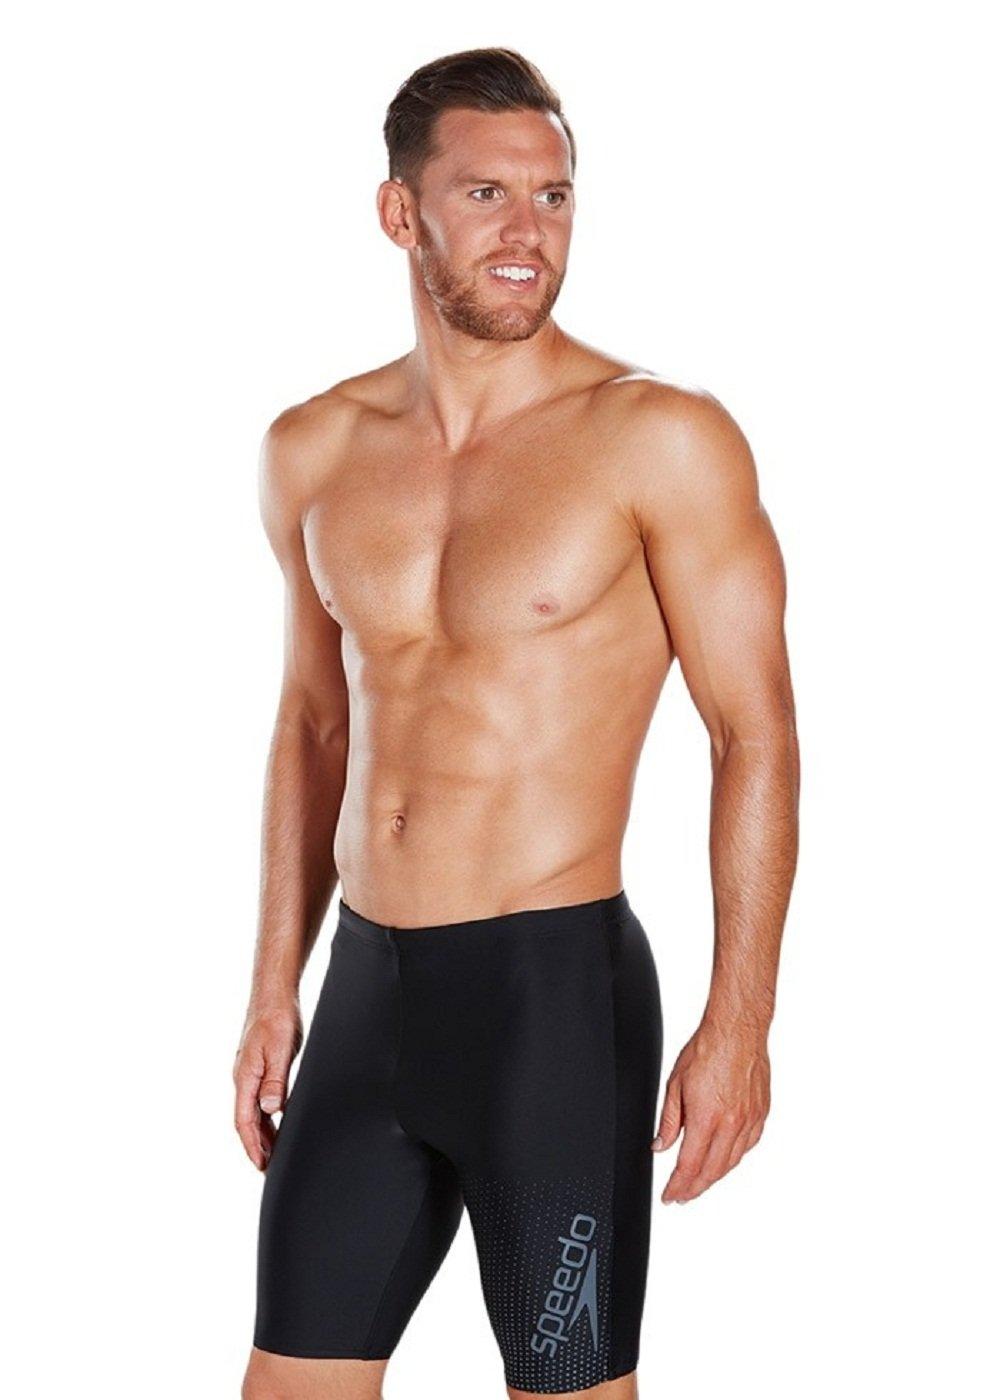 Speedo Men's Gala Logo Jammer Swimsuit (Black/USA Charcoal, Size 36) by Speedo